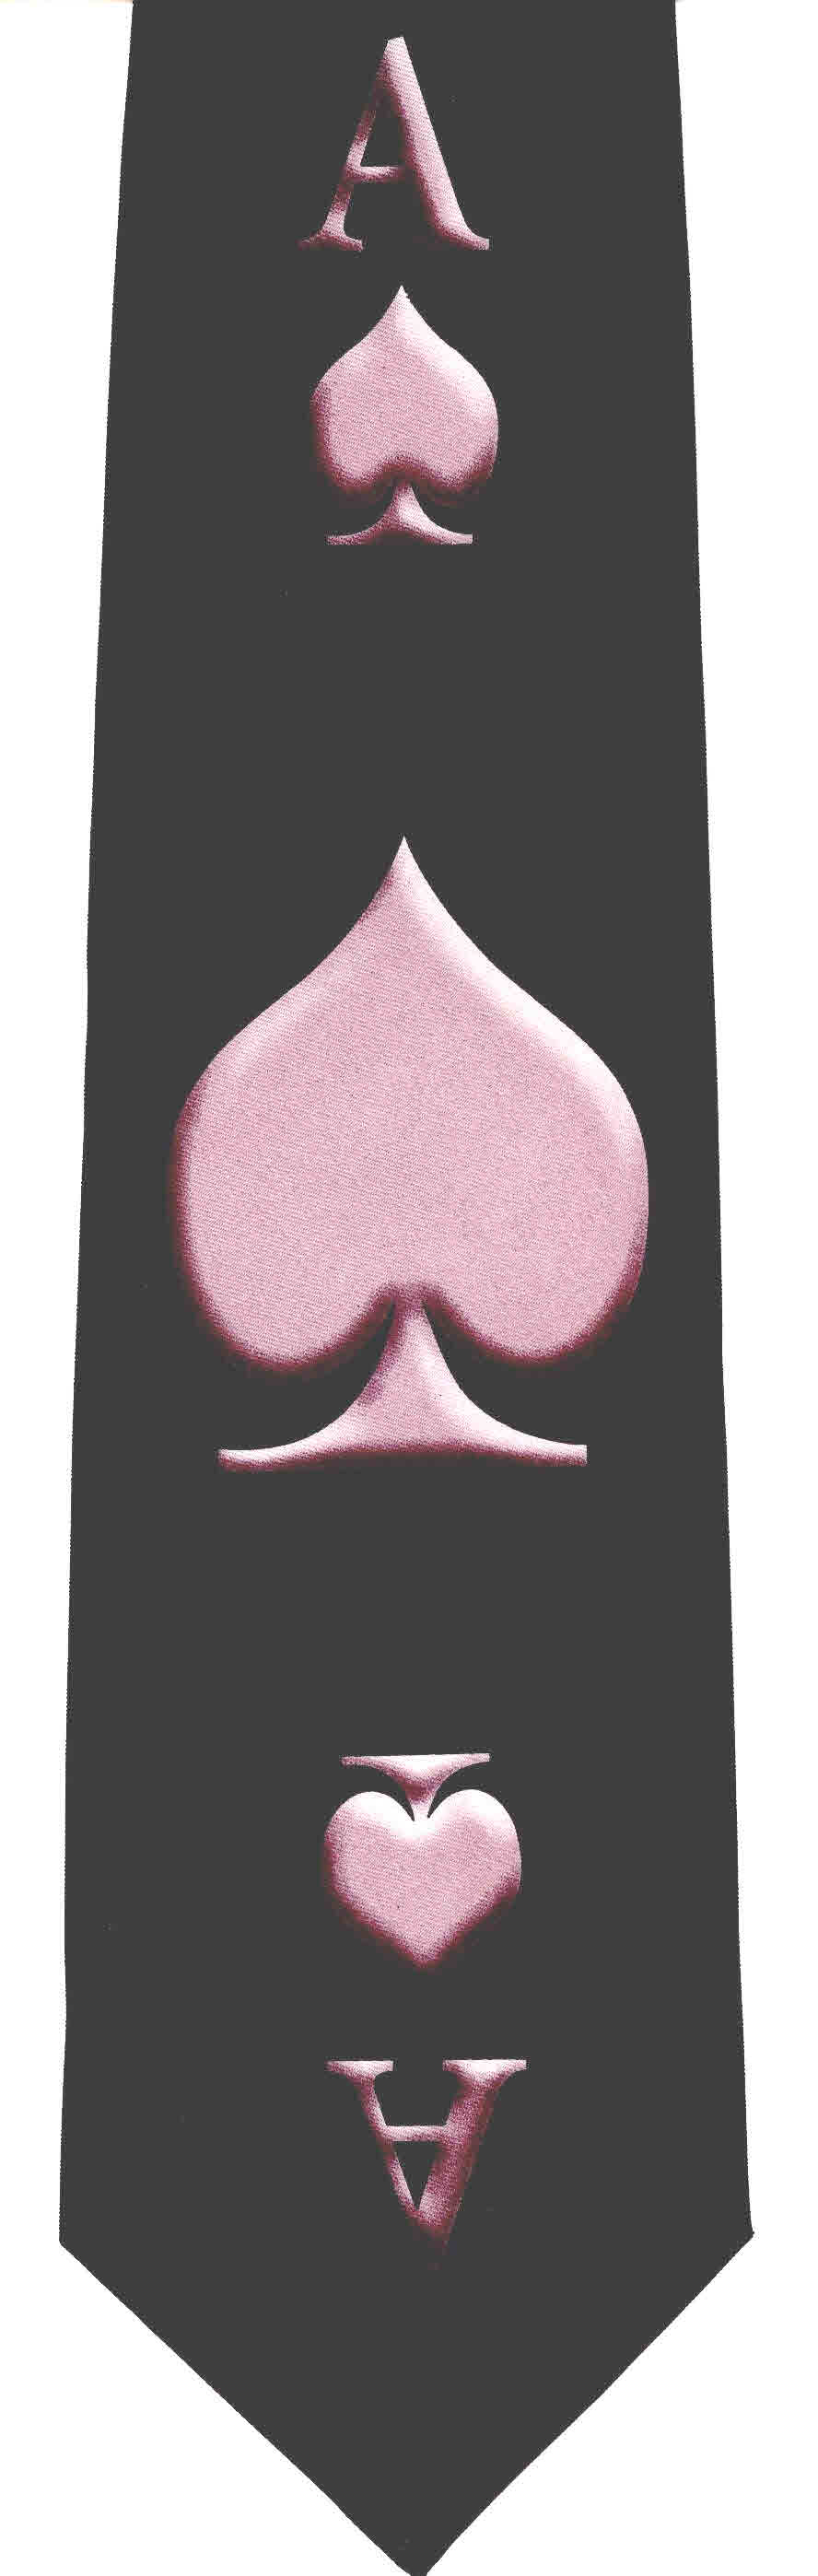 061 Ace Spades.jpg